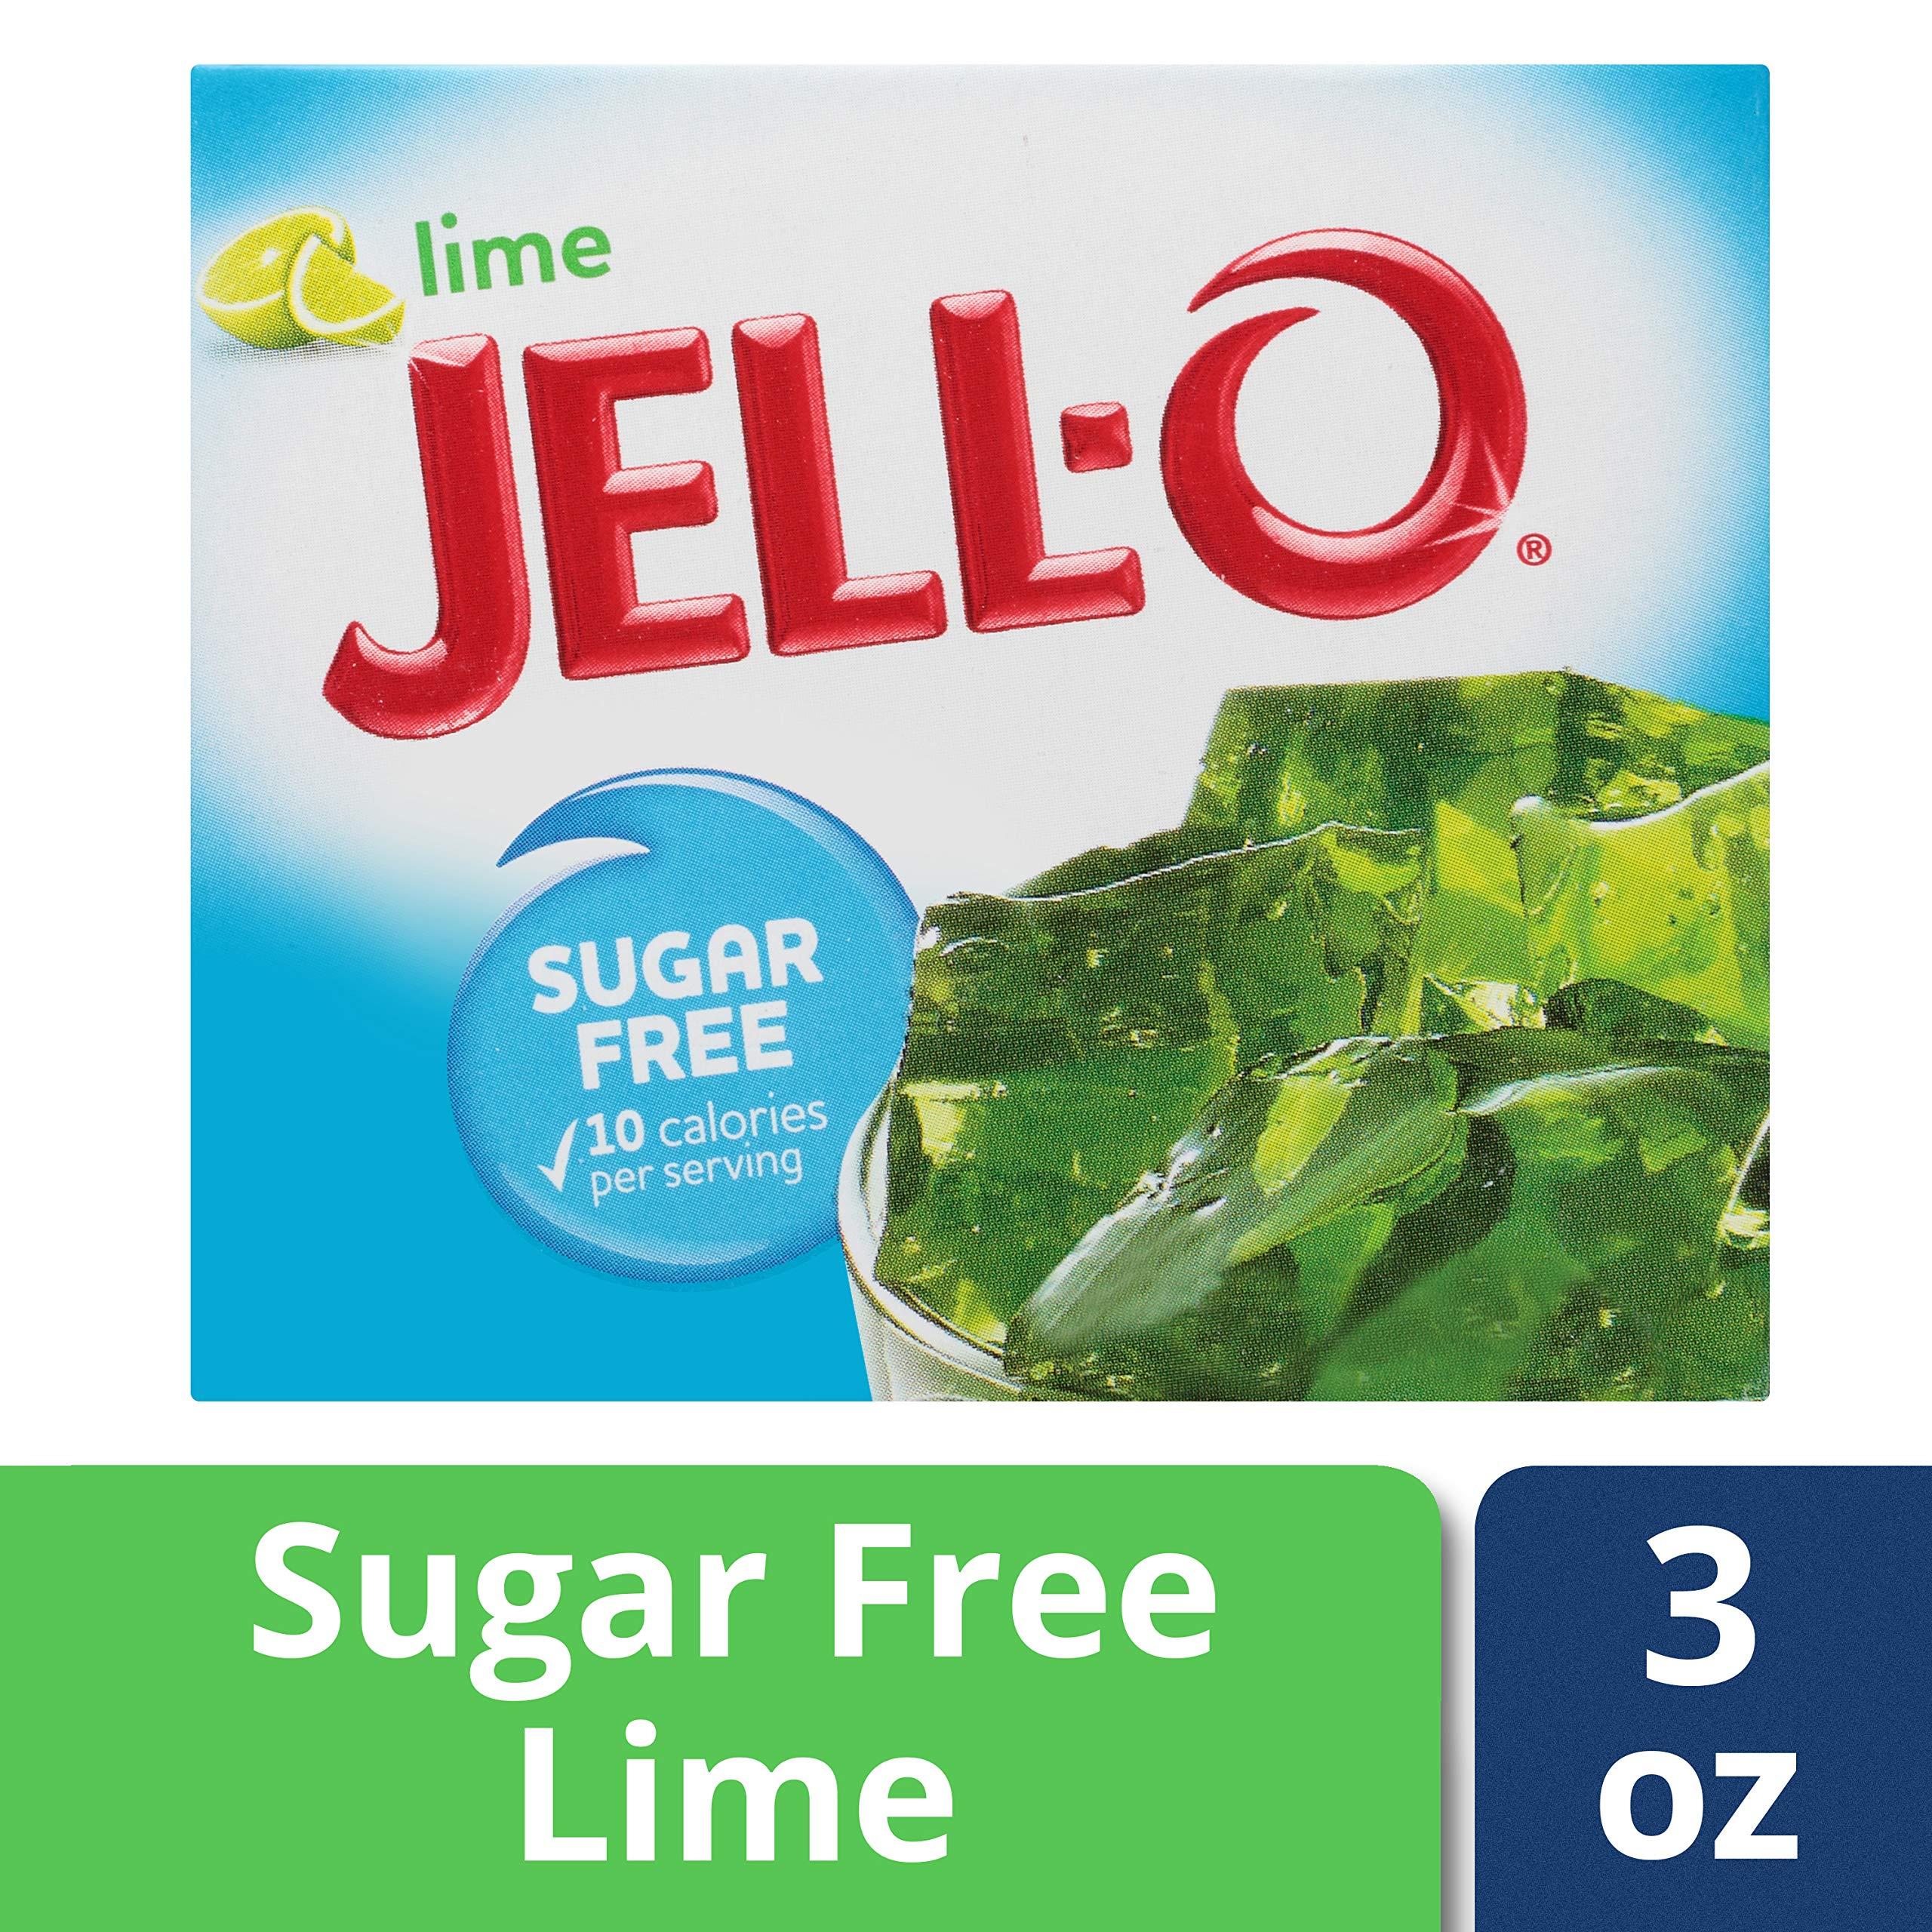 Jell-O Sugar-Free Lime Gelatin Dessert Mix, 0.3 oz Box